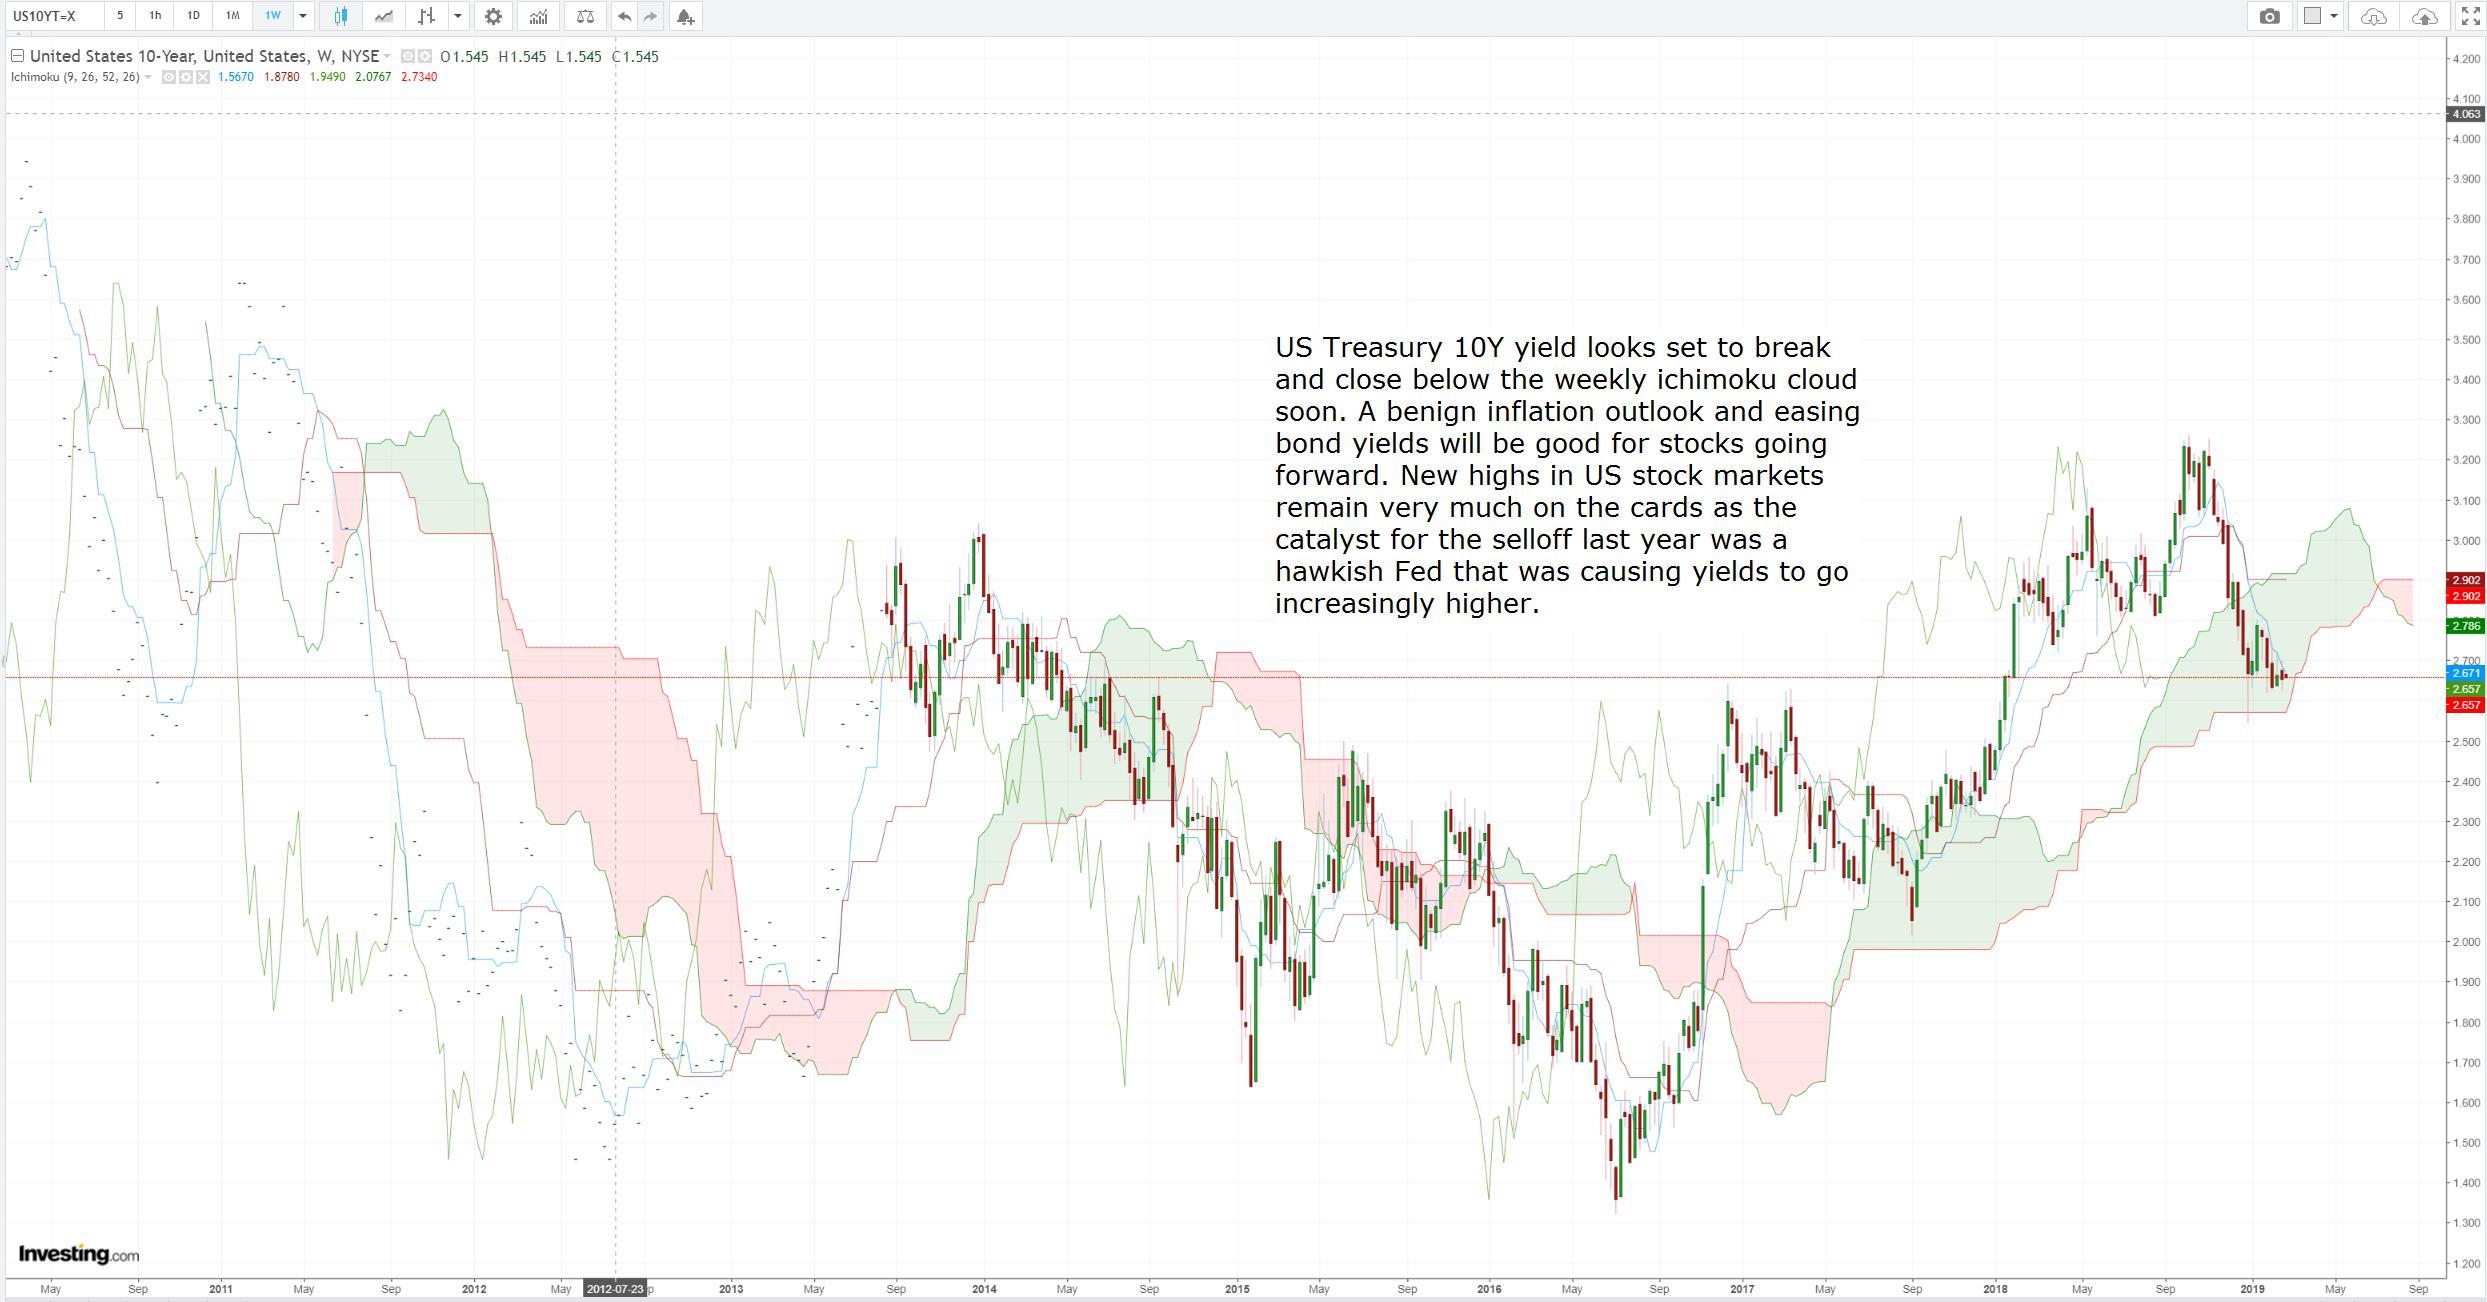 Trade Opportunity: US Treasury 10Y yield looks set to break